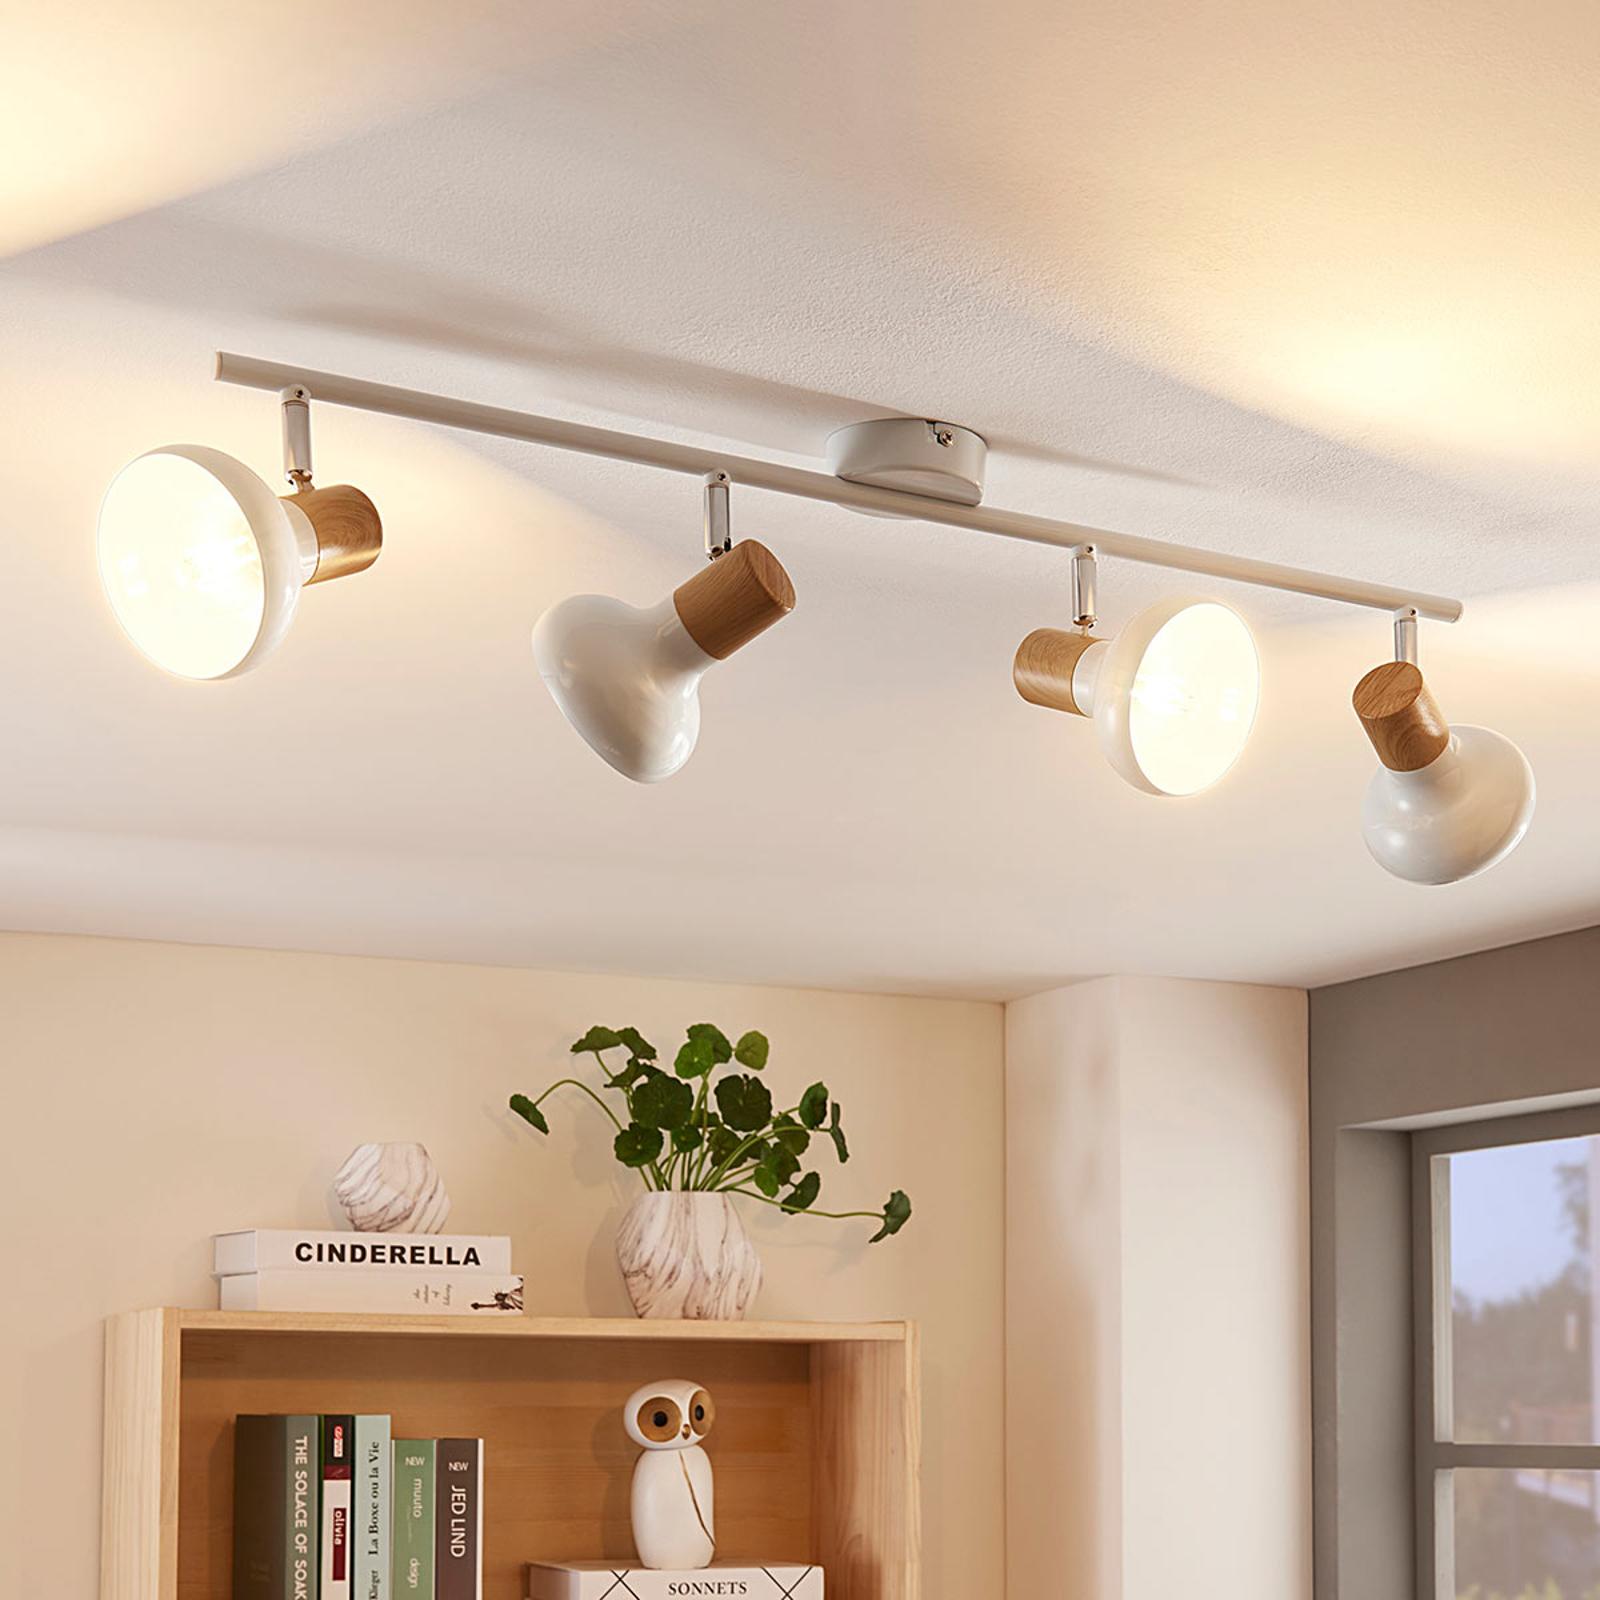 Langwerpige plafondlamp Fridolin, 4 lampen